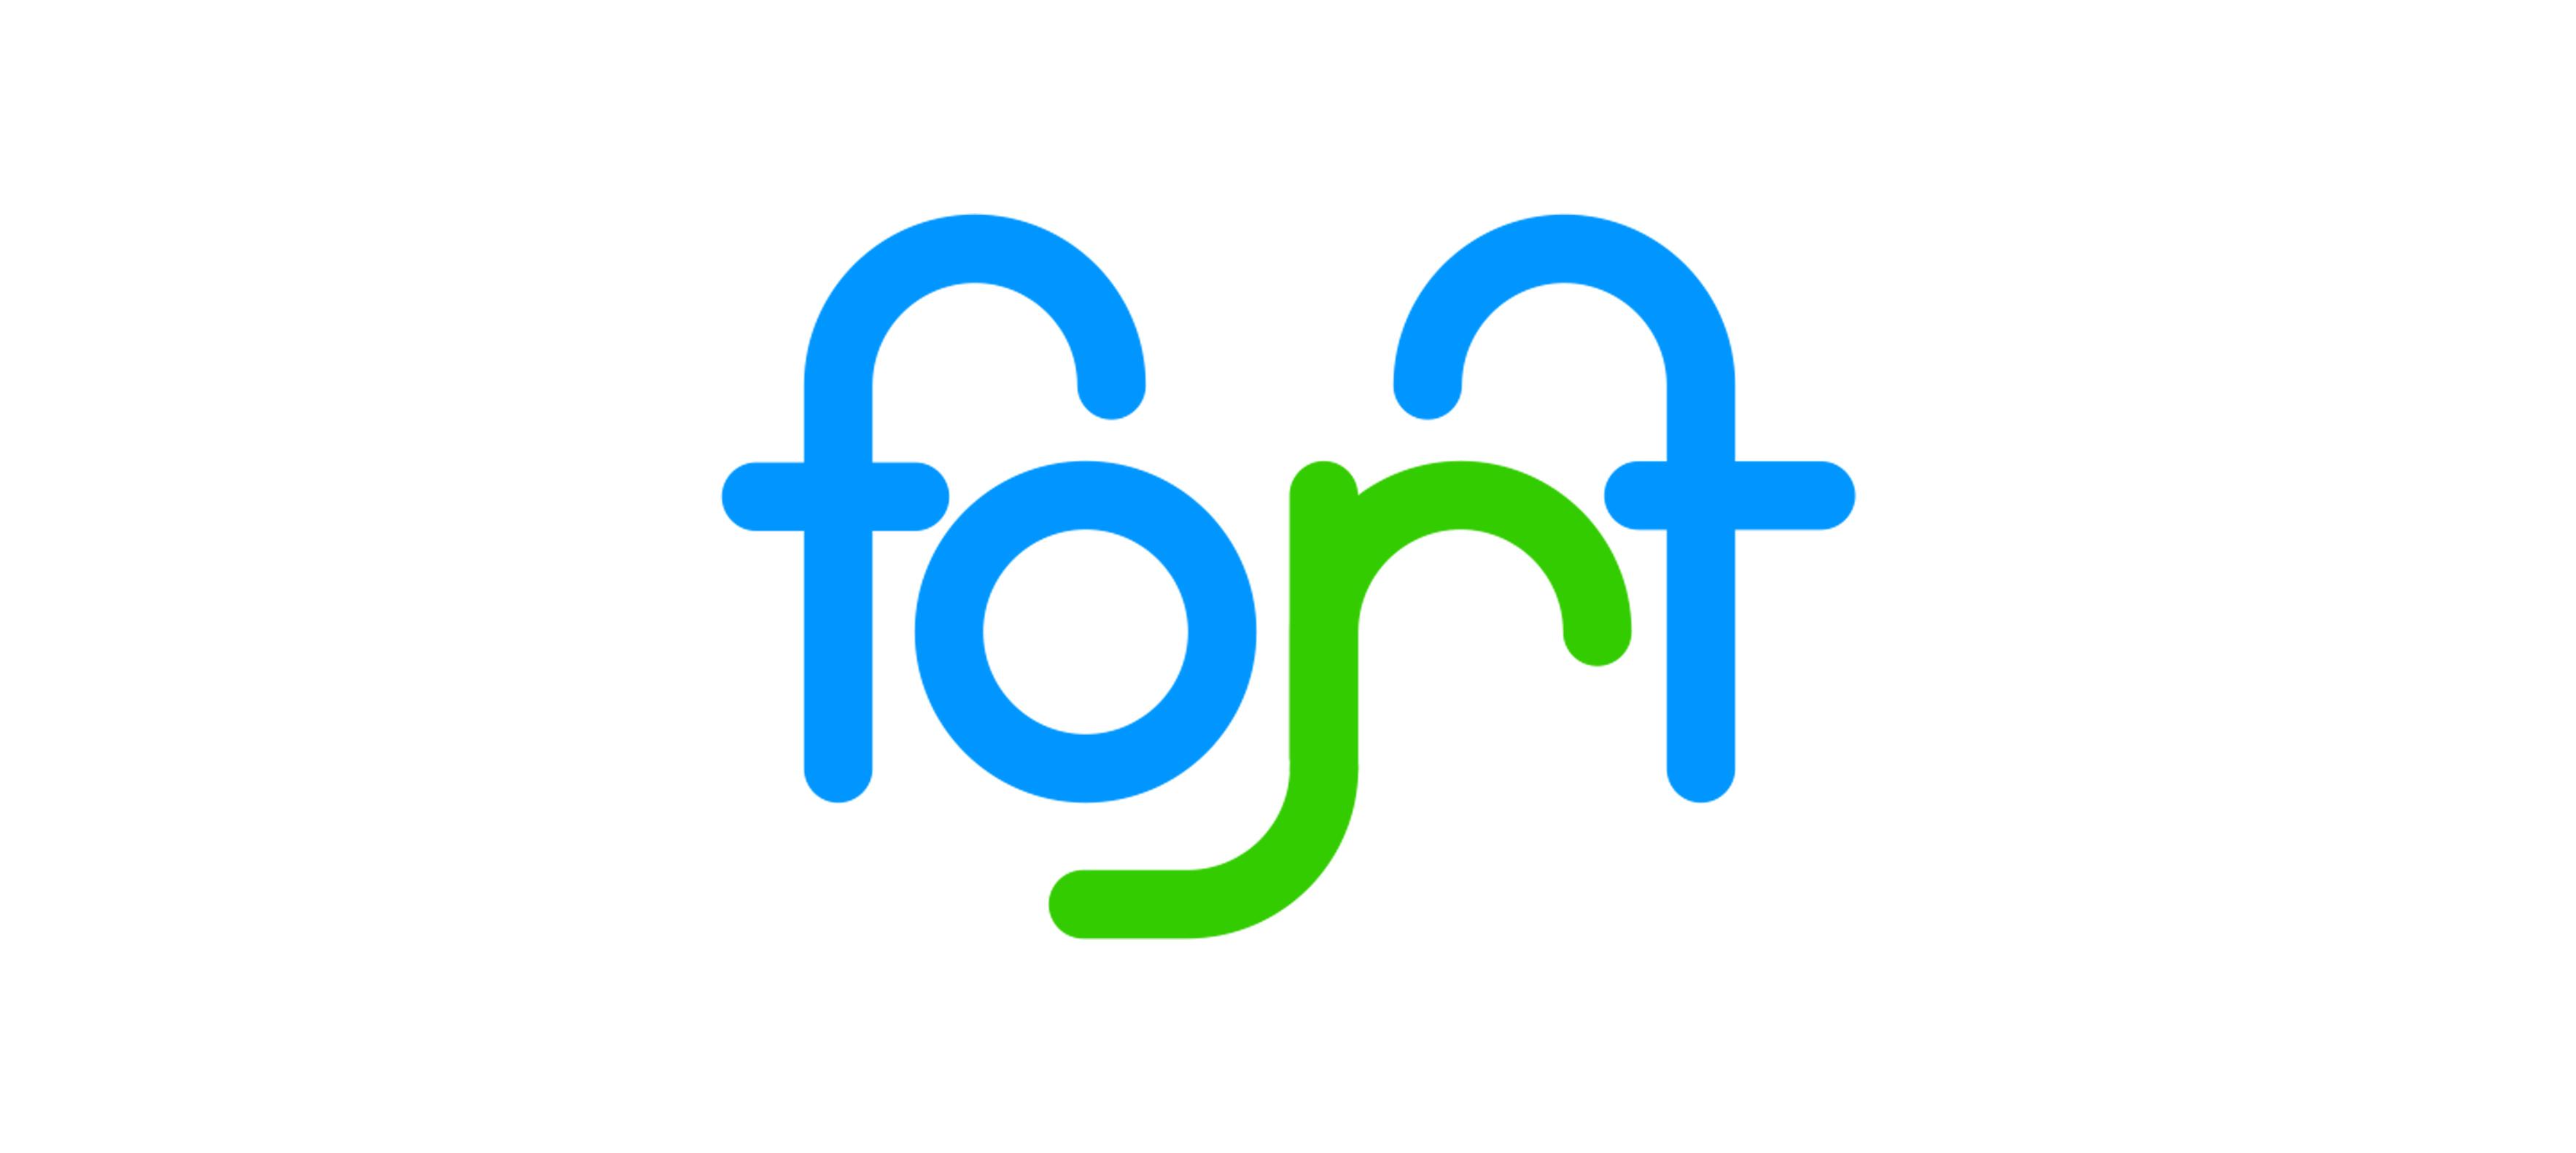 Разработка логотипа финансовой компании фото f_5405a871ad8874ad.jpg